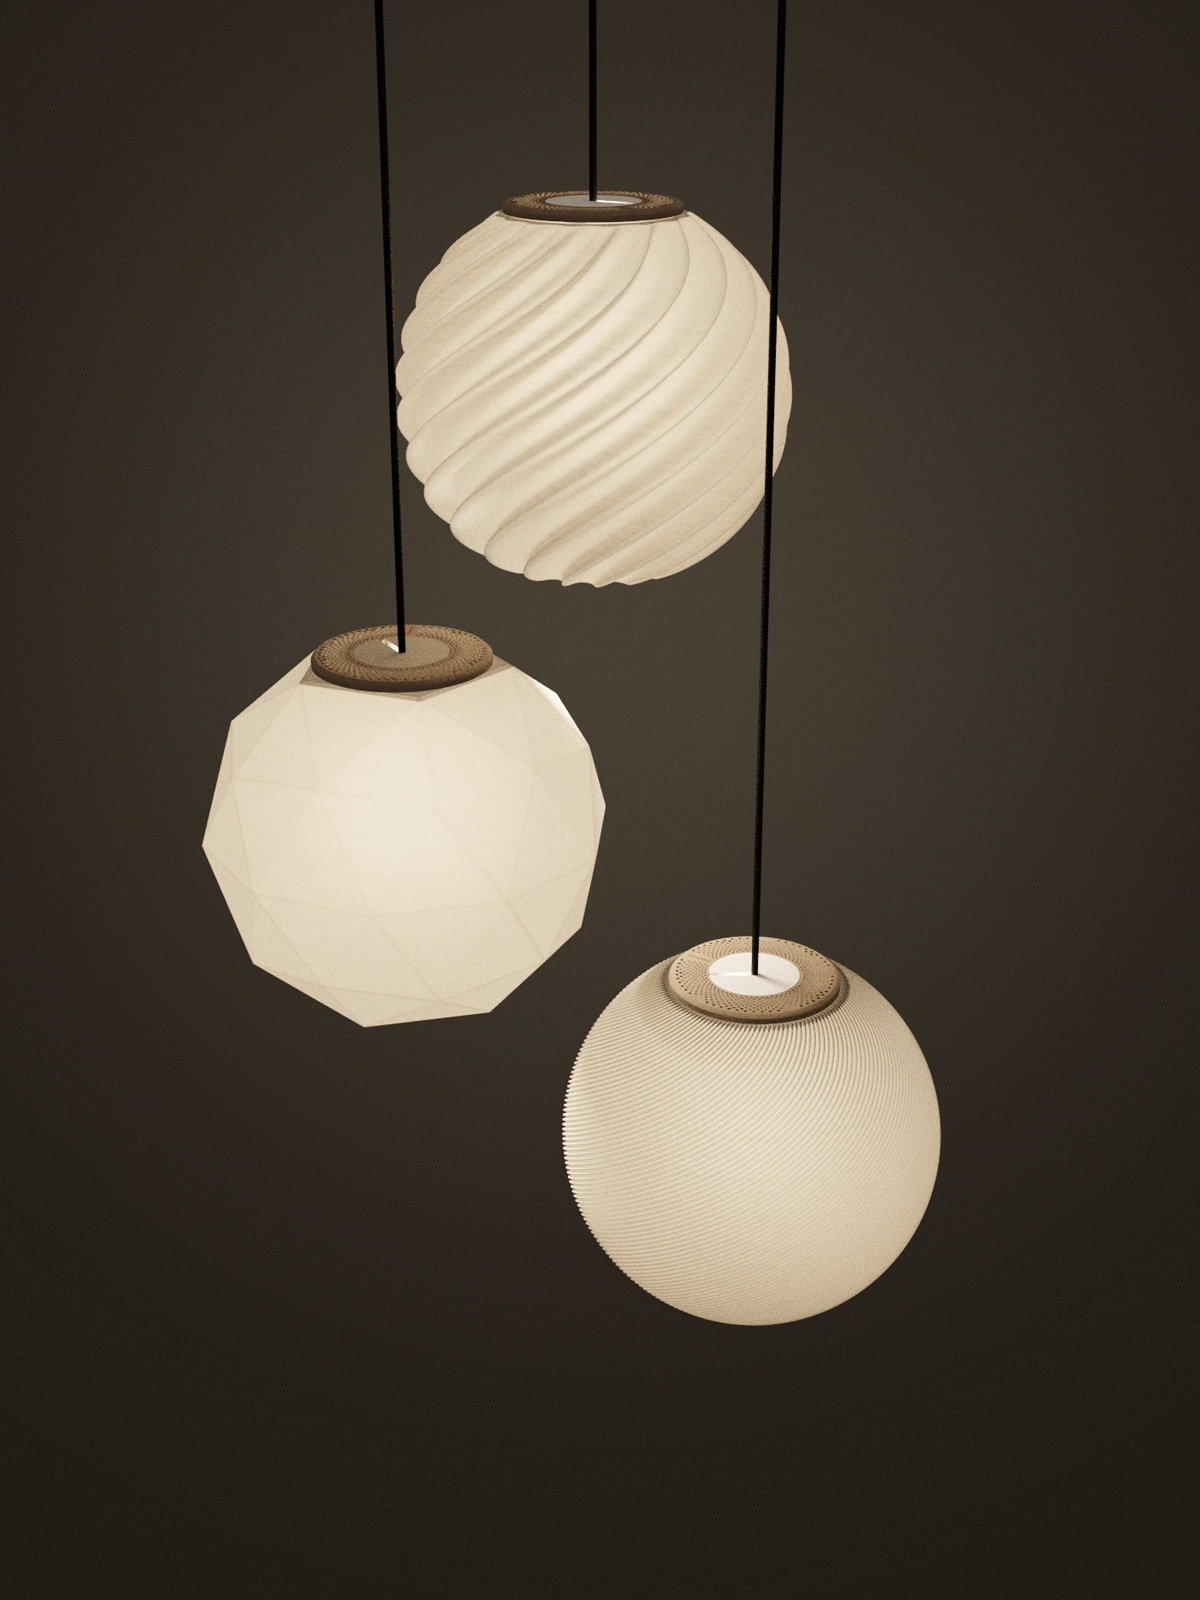 Random 3a Flachs Polyluma Designerlampe Designort